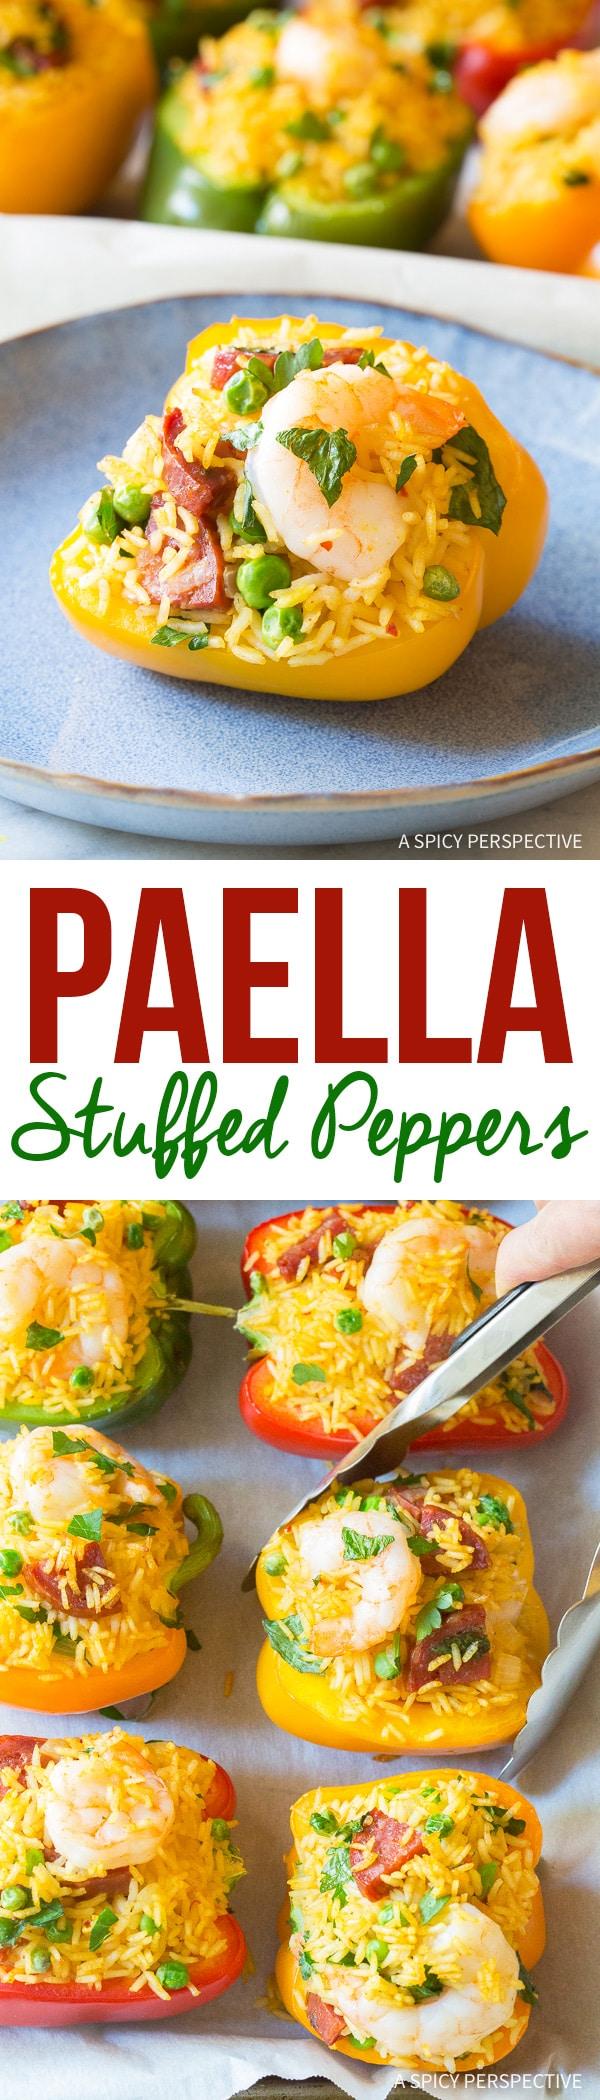 Spanish Paella Stuffed Peppers Recipe